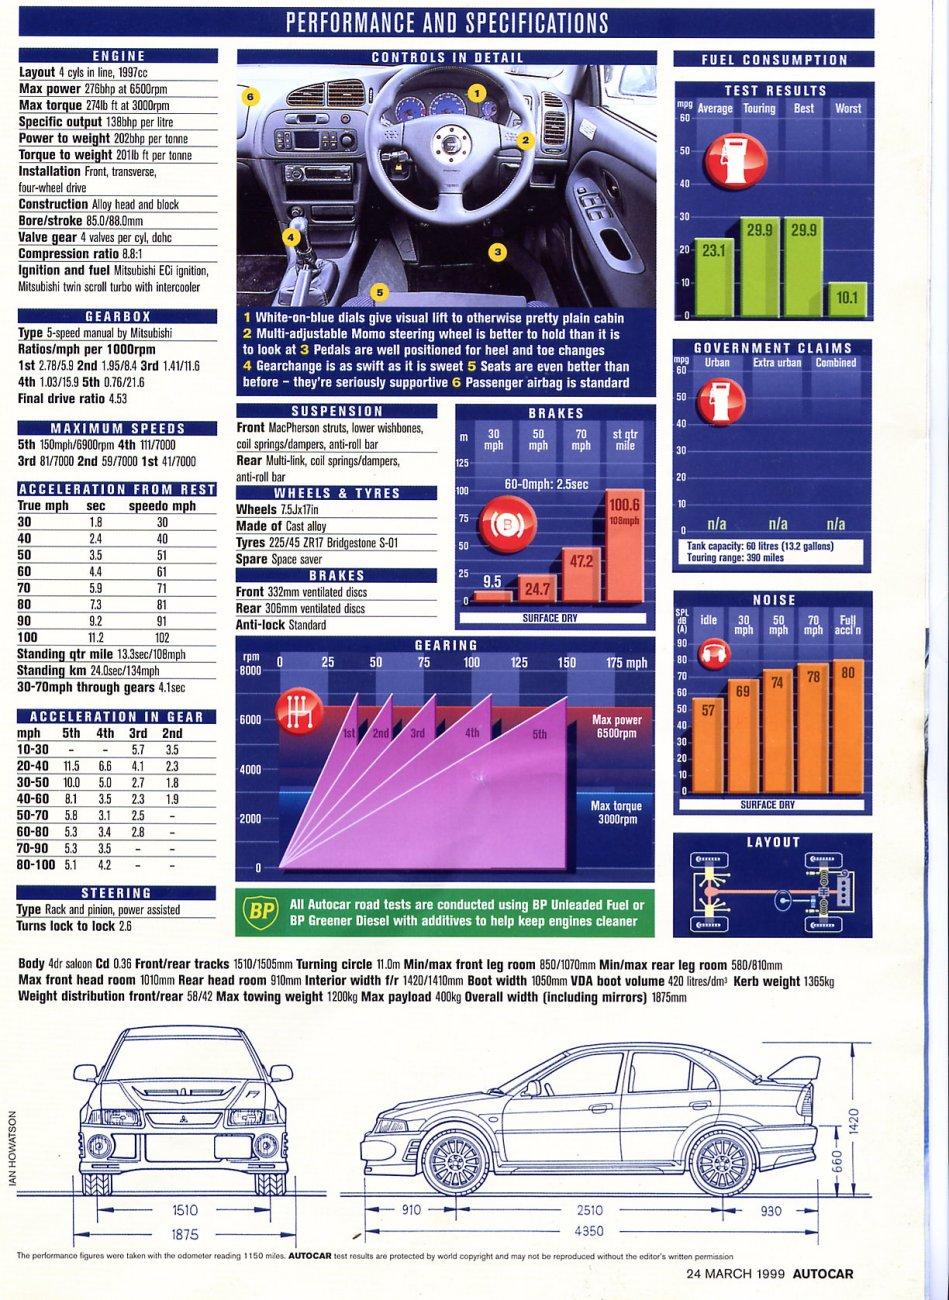 Mitsubishi Lancer Register